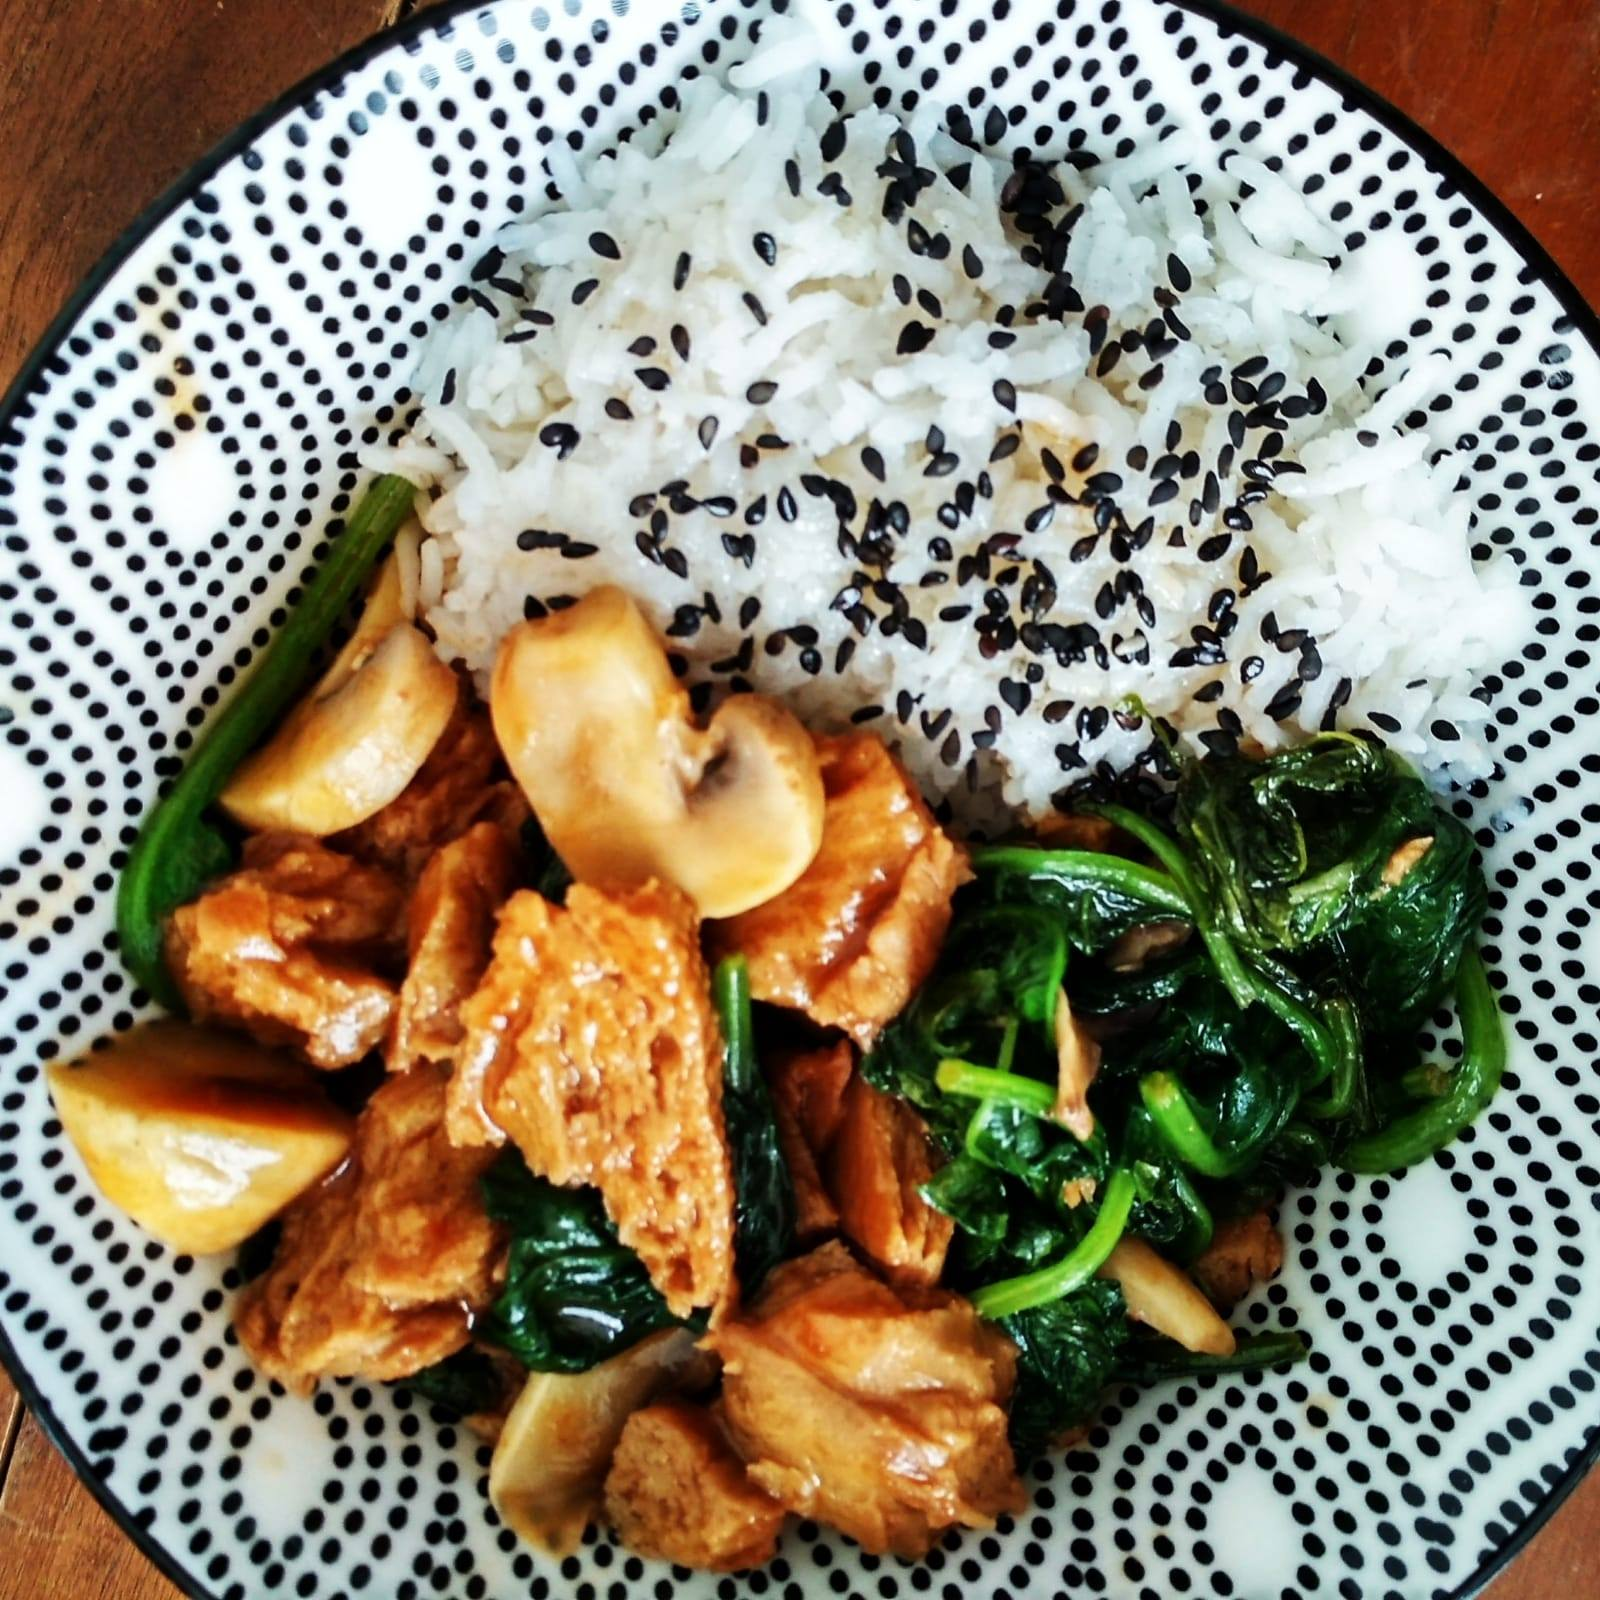 Tasty vegetarian meals